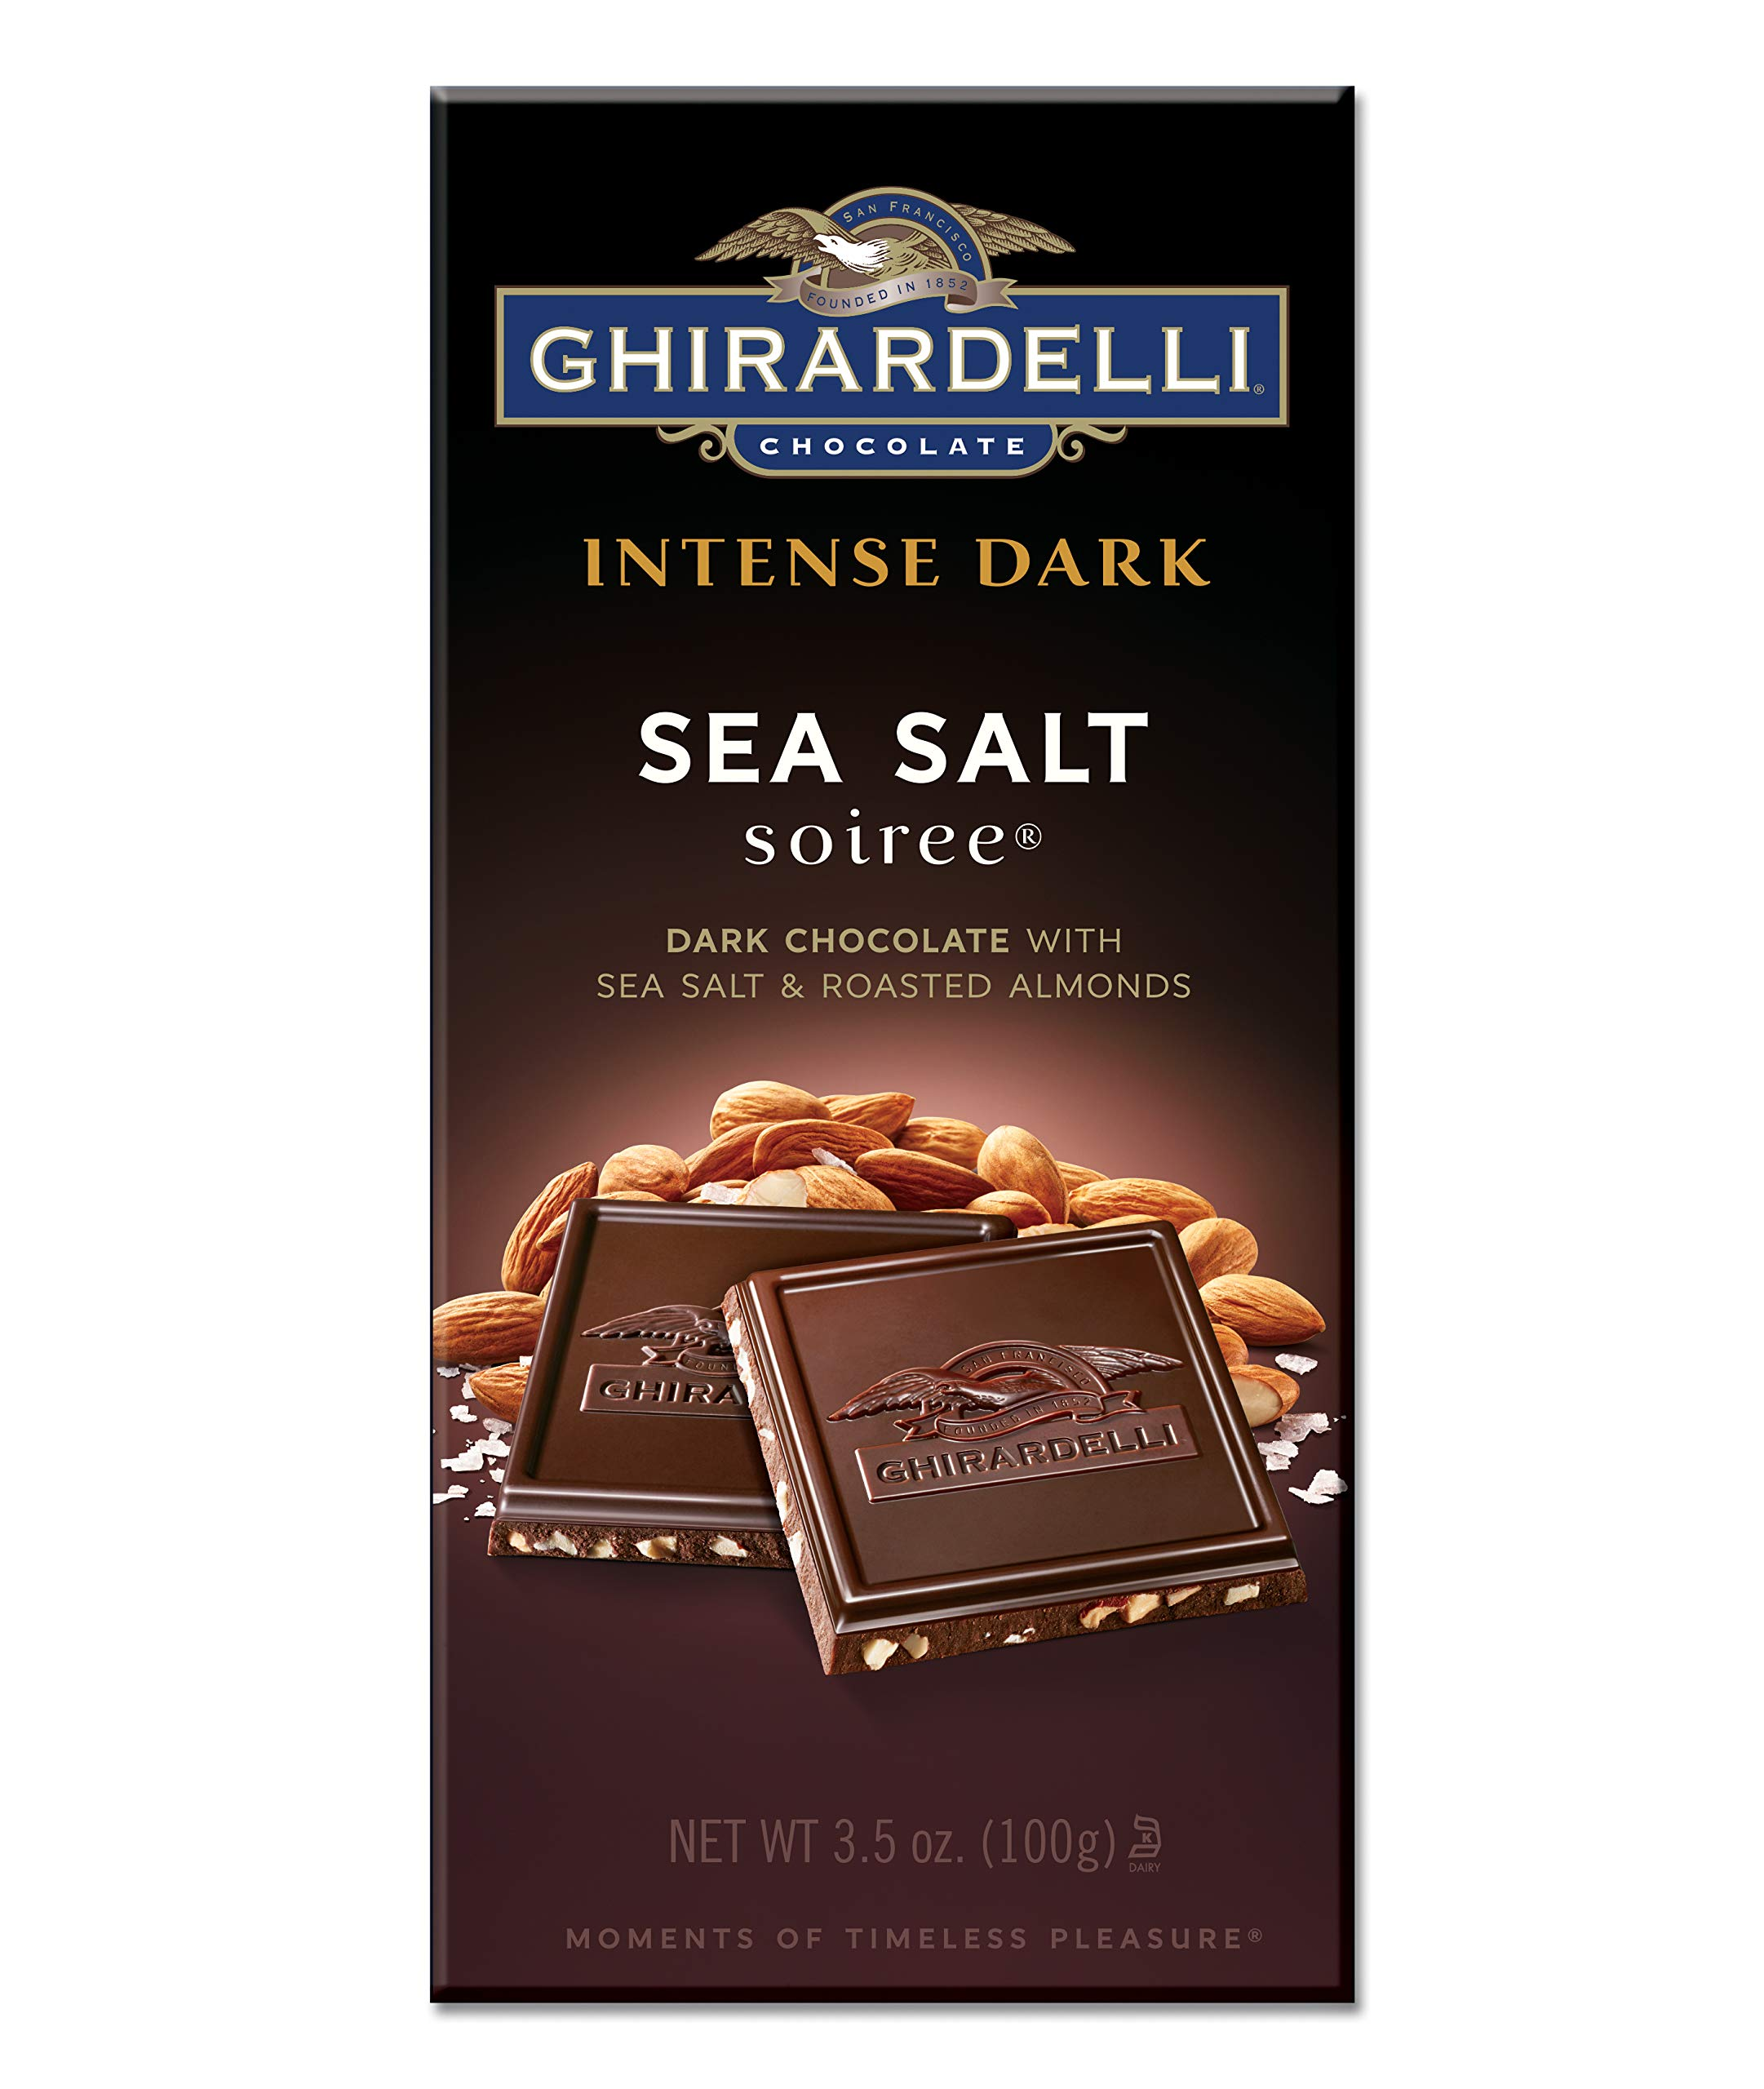 Ghirardelli Intense Dark Chocolate Sea Salt Soiree Bar, 3.5 oz, Pack of 6